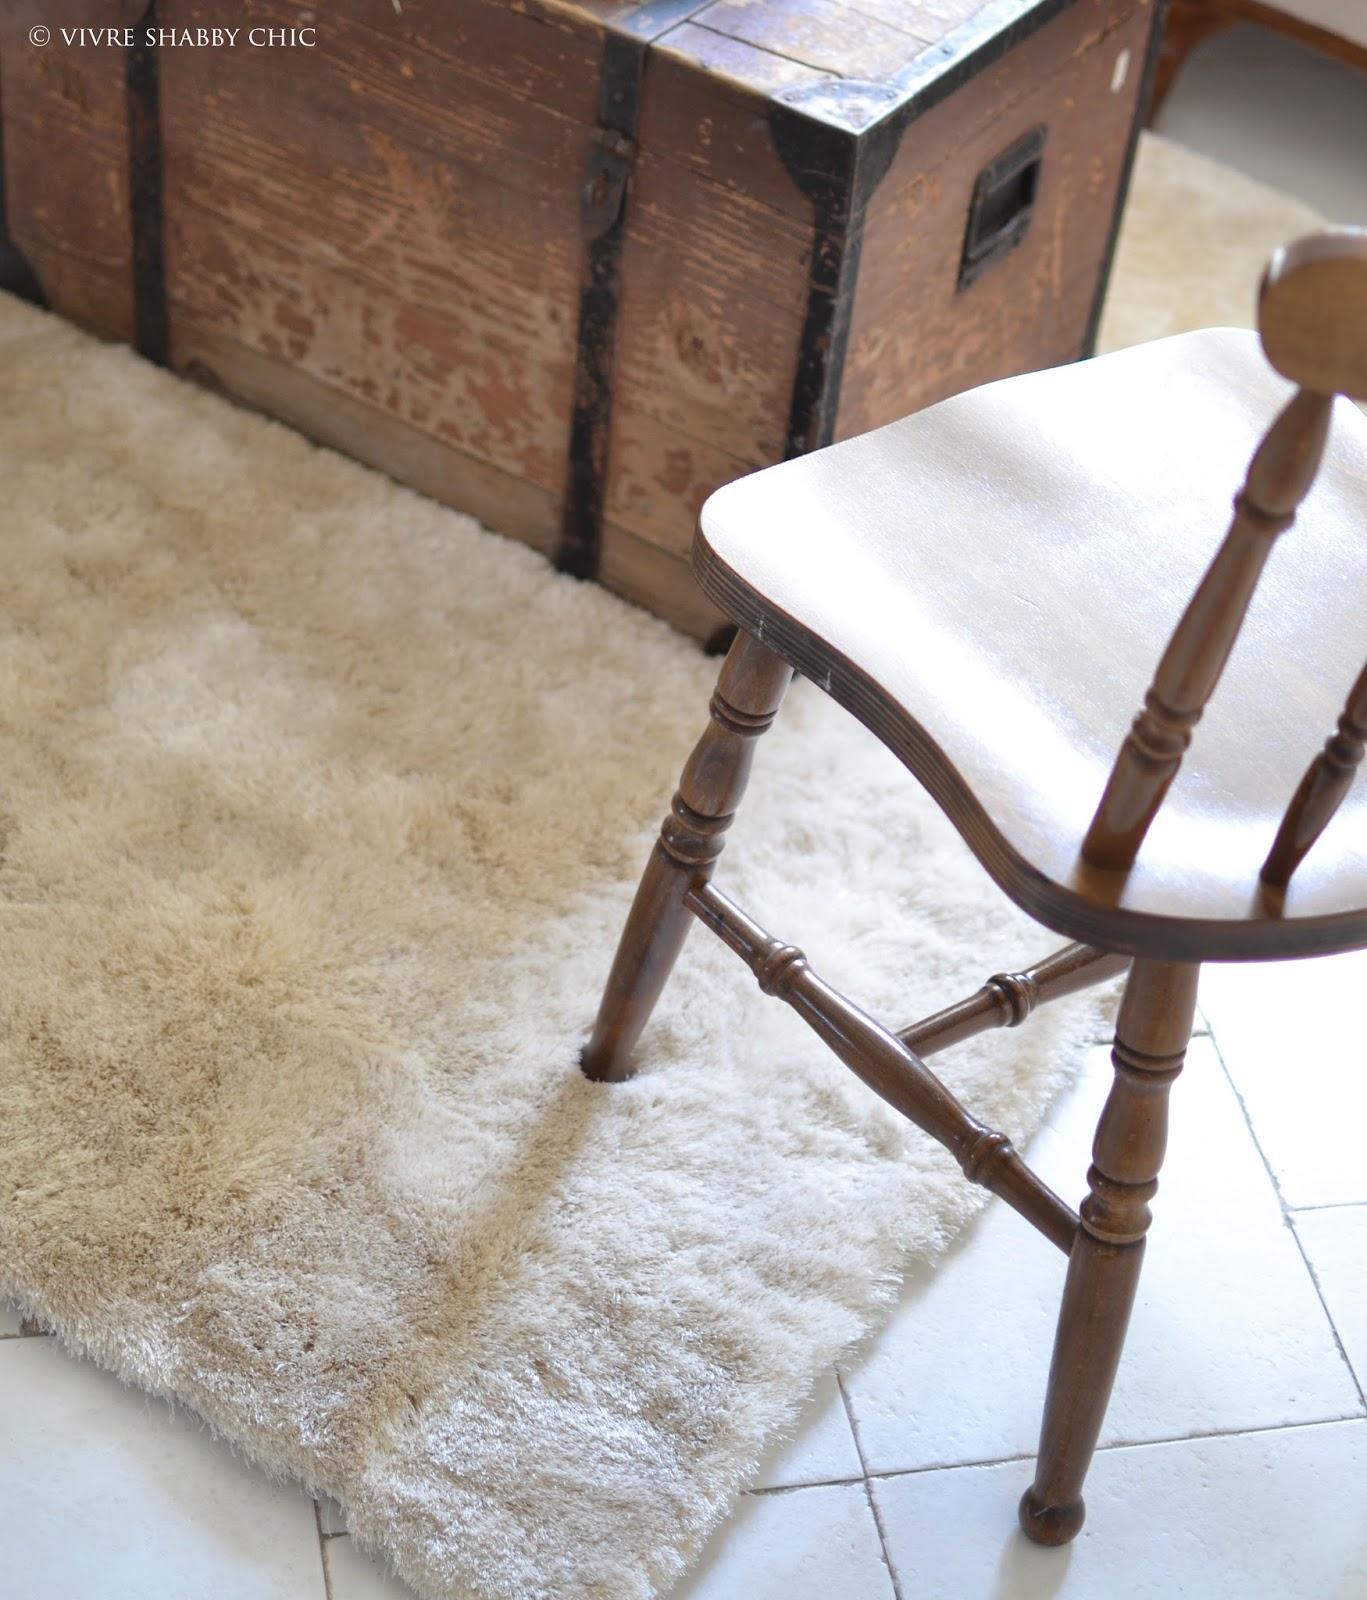 vivre shabby chic benuta tappeti di tendenza. Black Bedroom Furniture Sets. Home Design Ideas